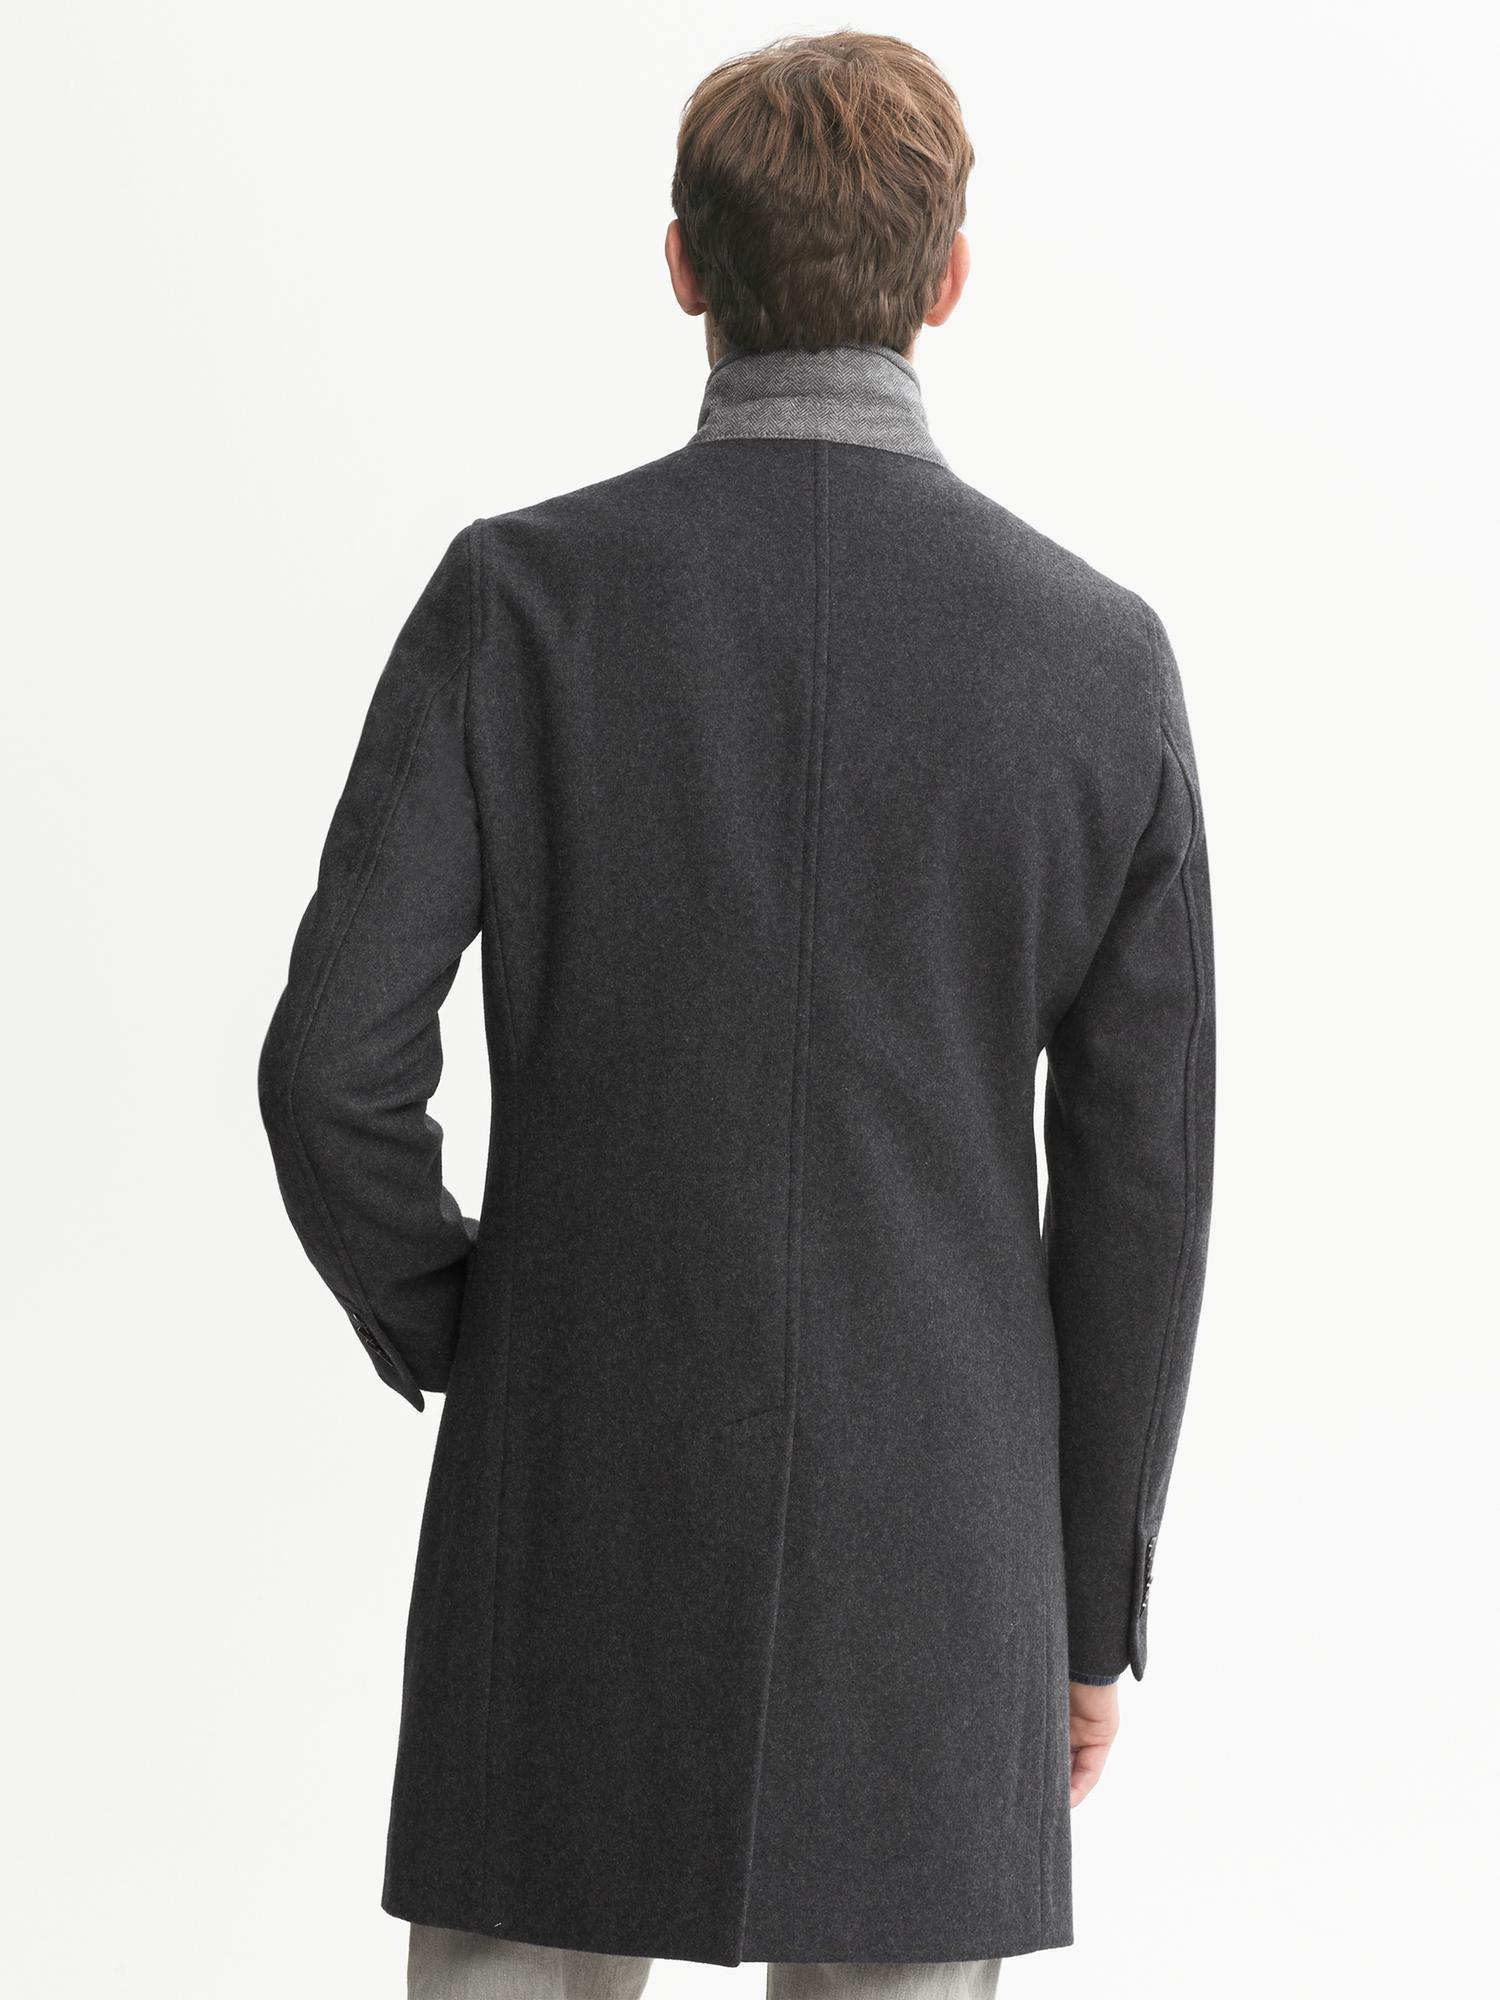 Banana Republic Wool Double Layer Coat In Charcoal Black